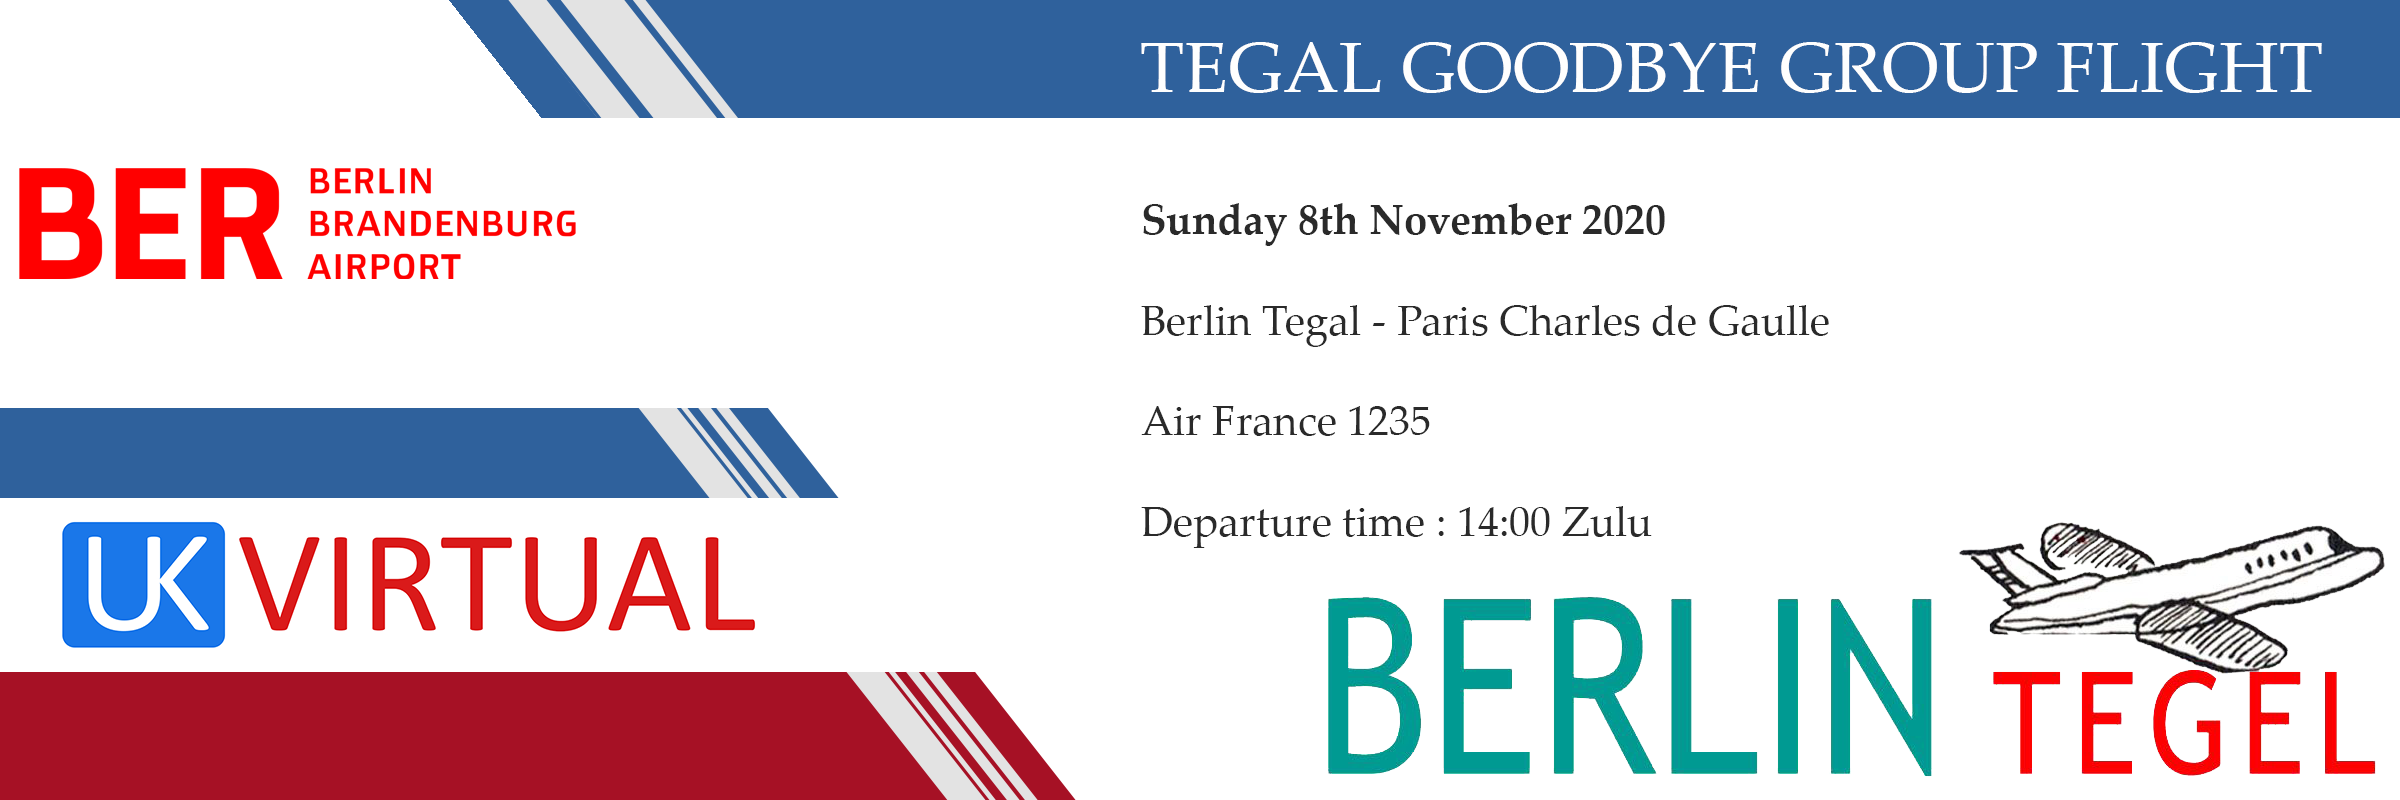 New Group Flight – 08/11/2020 14:00